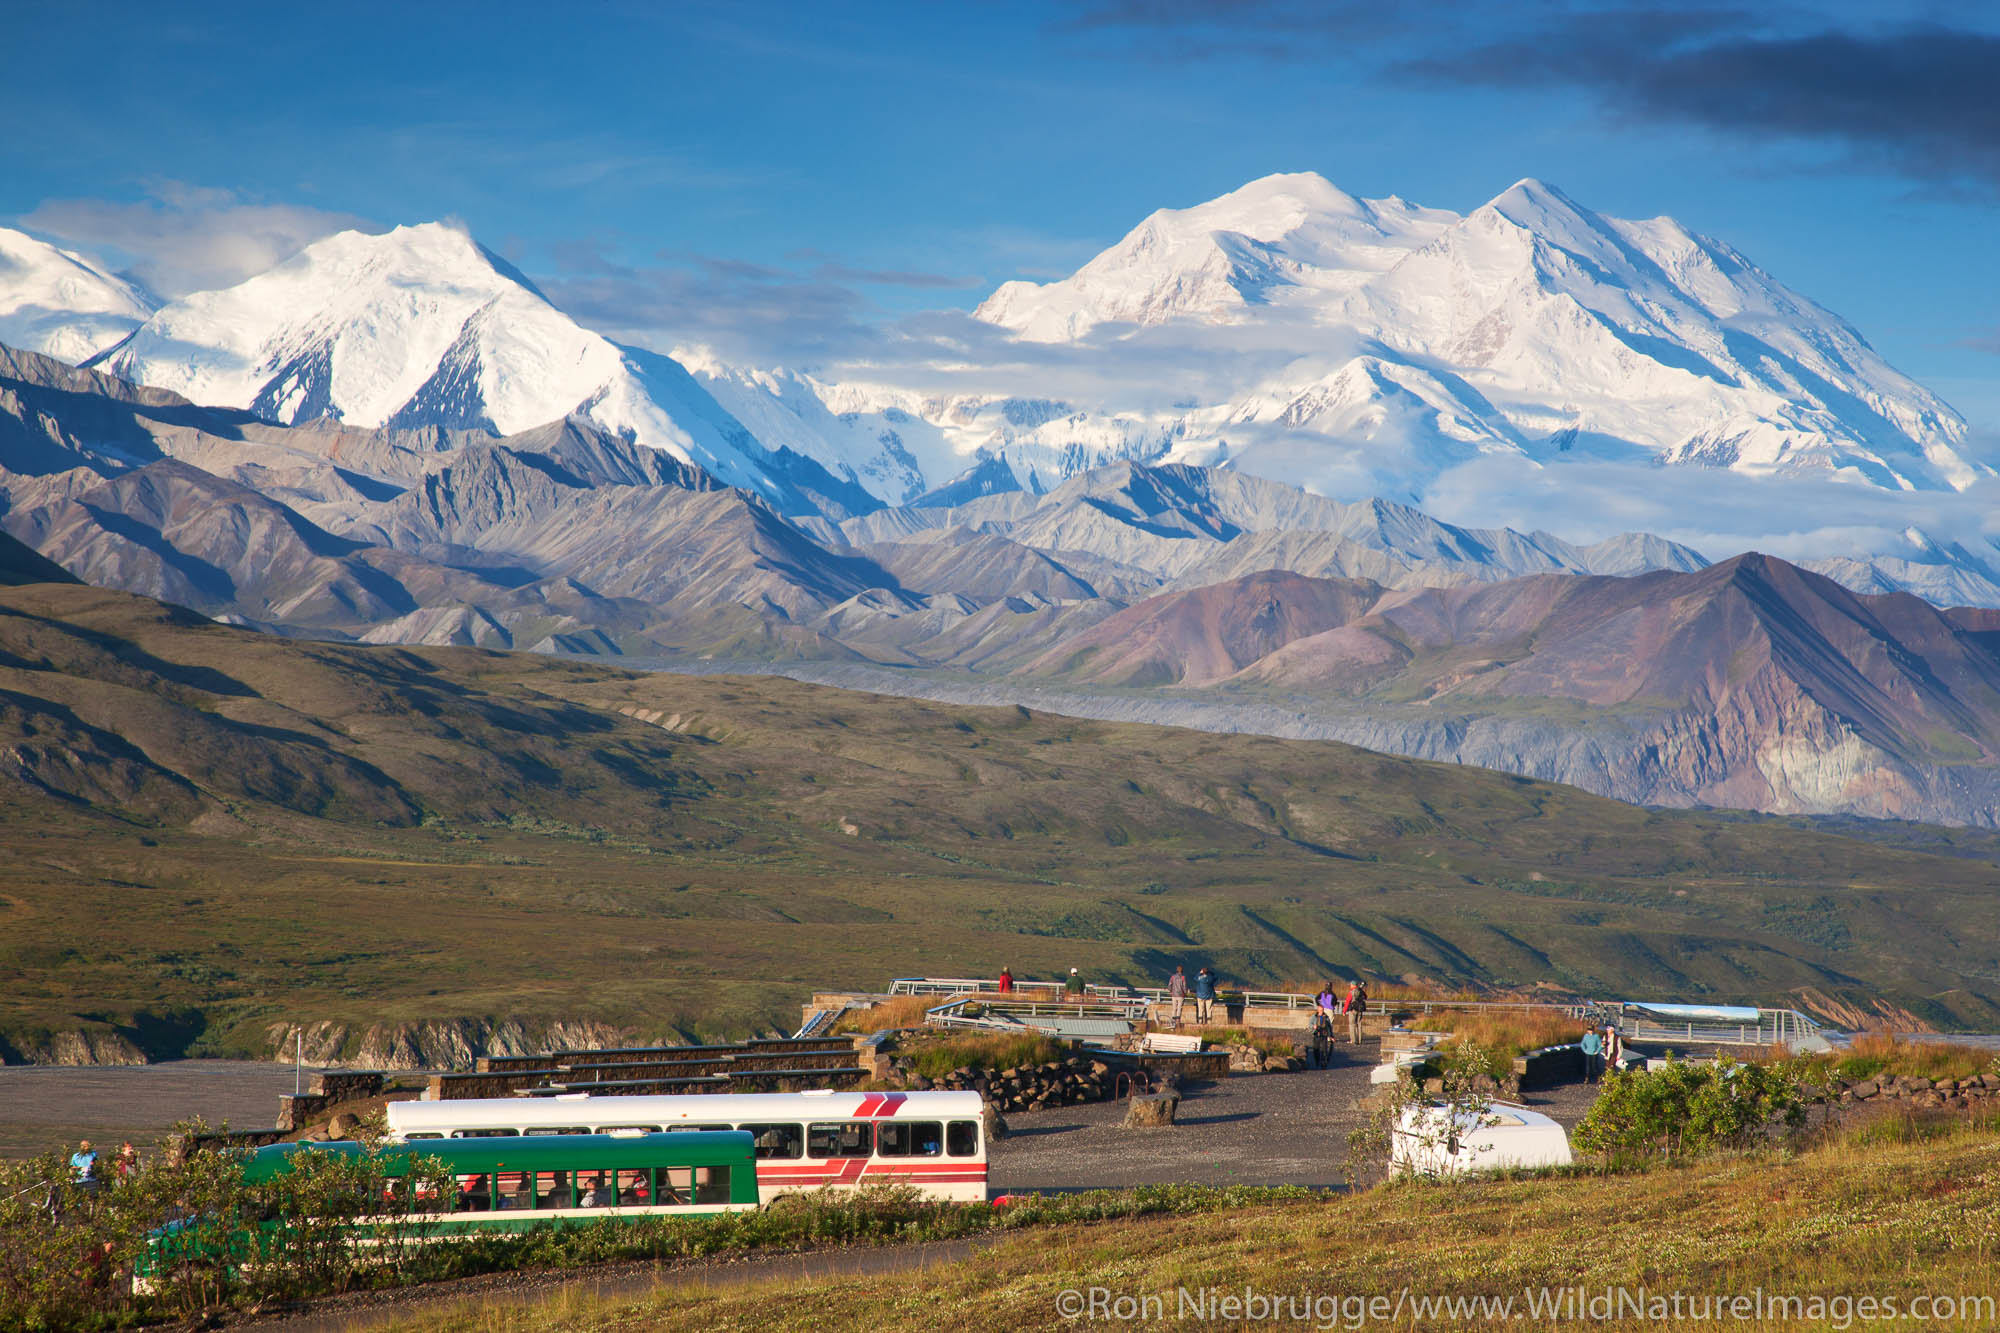 Mt. McKinley and the Eielson Visitor Center, Denali National Park, Alaska.